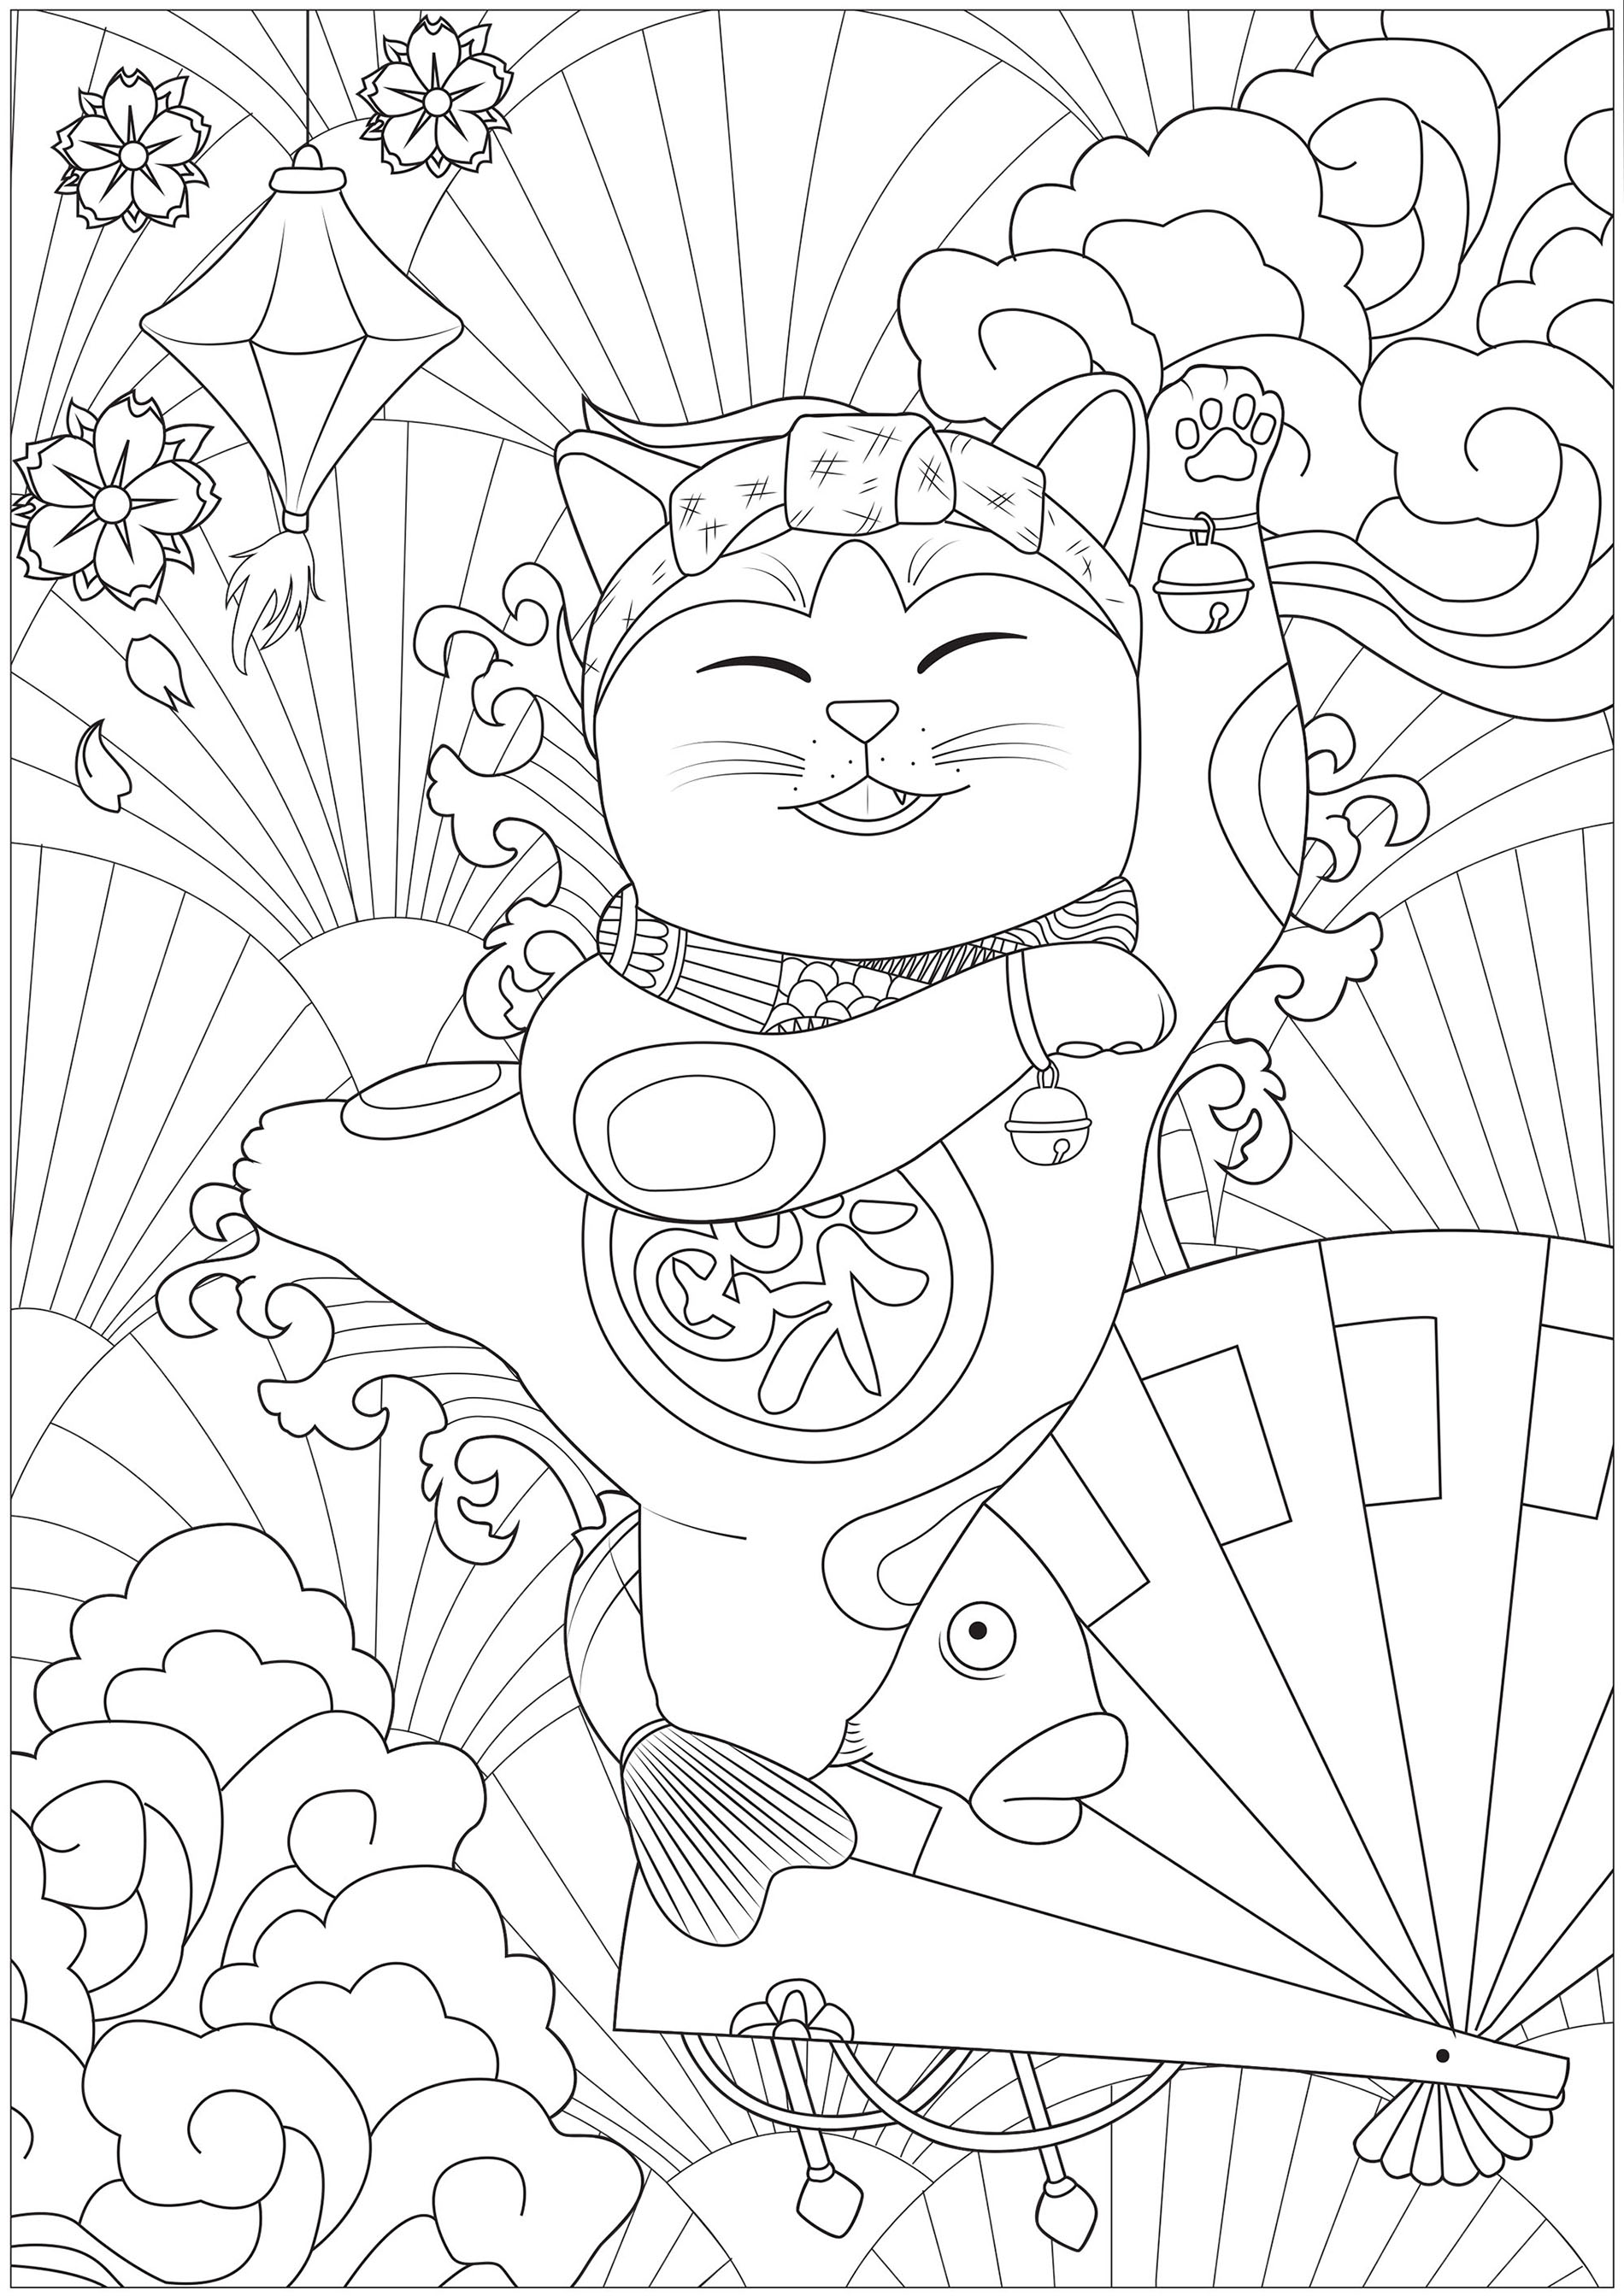 Simple Maneki Neko coloring page for kids